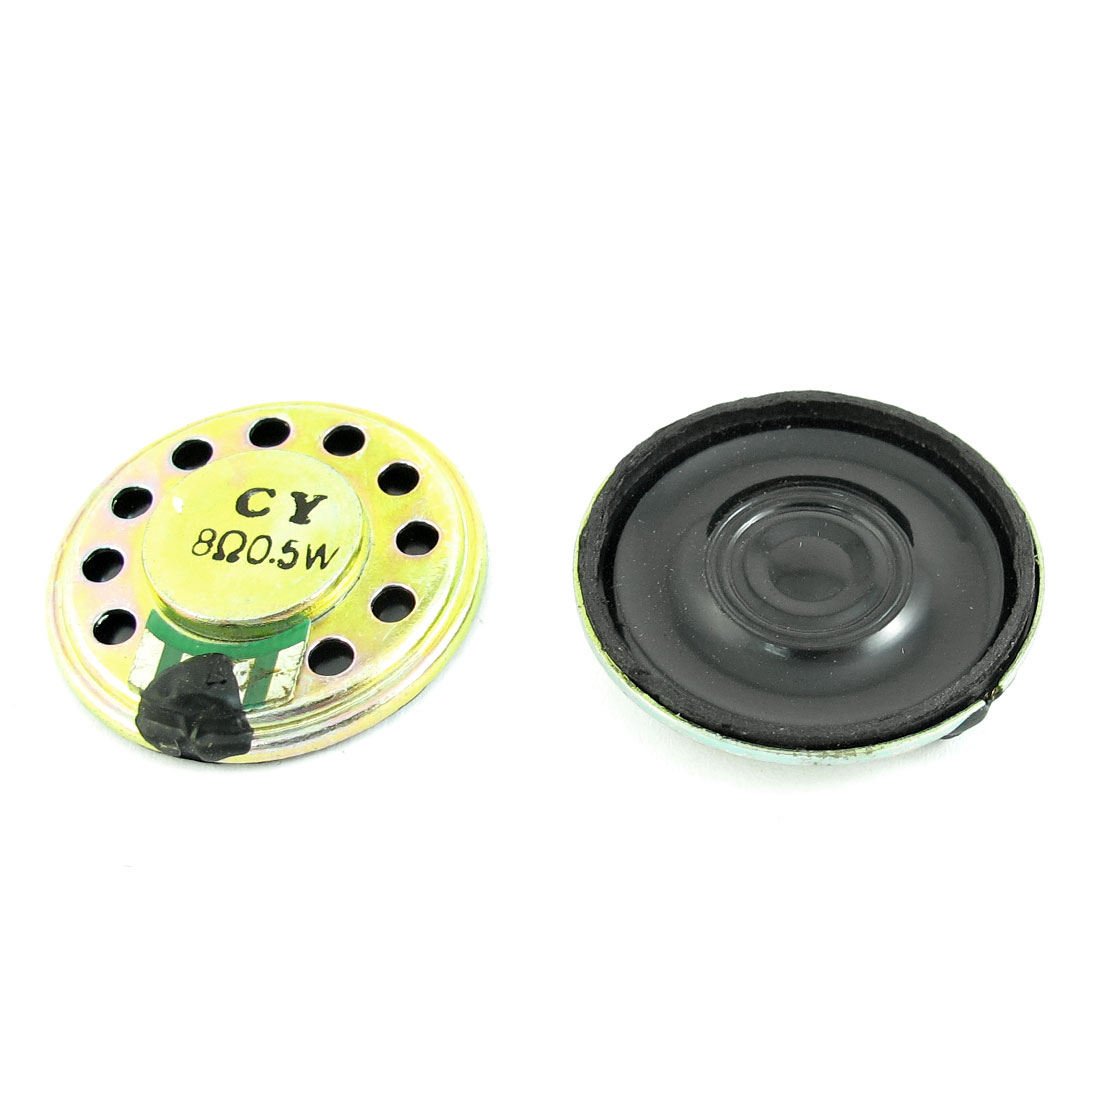 2 Pcs 0.5W 8 Ohm 28mm Diameter Round Magnet Speaker Loudspeaker Horn for Radio Electric Toys